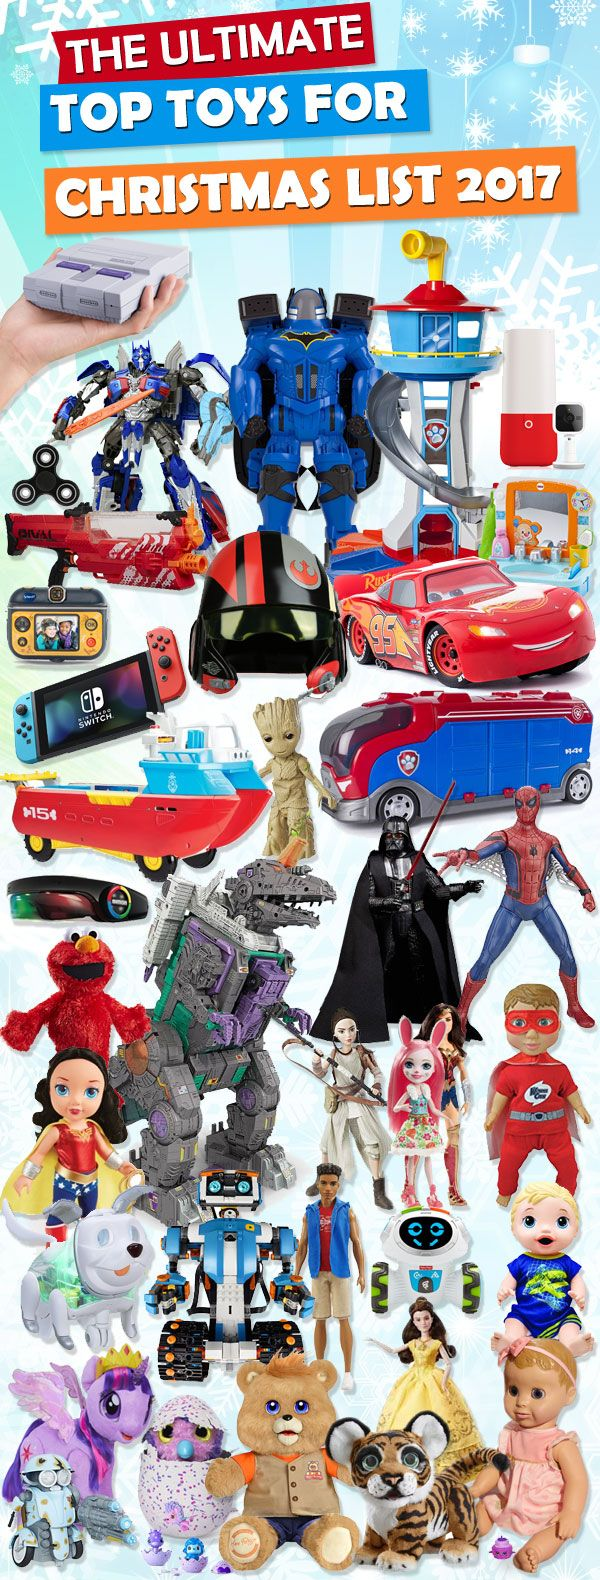 Popular Christmas Toys 2017 >> Top Toys For Christmas 2019 Christmas Gifts Top Christmas Toys